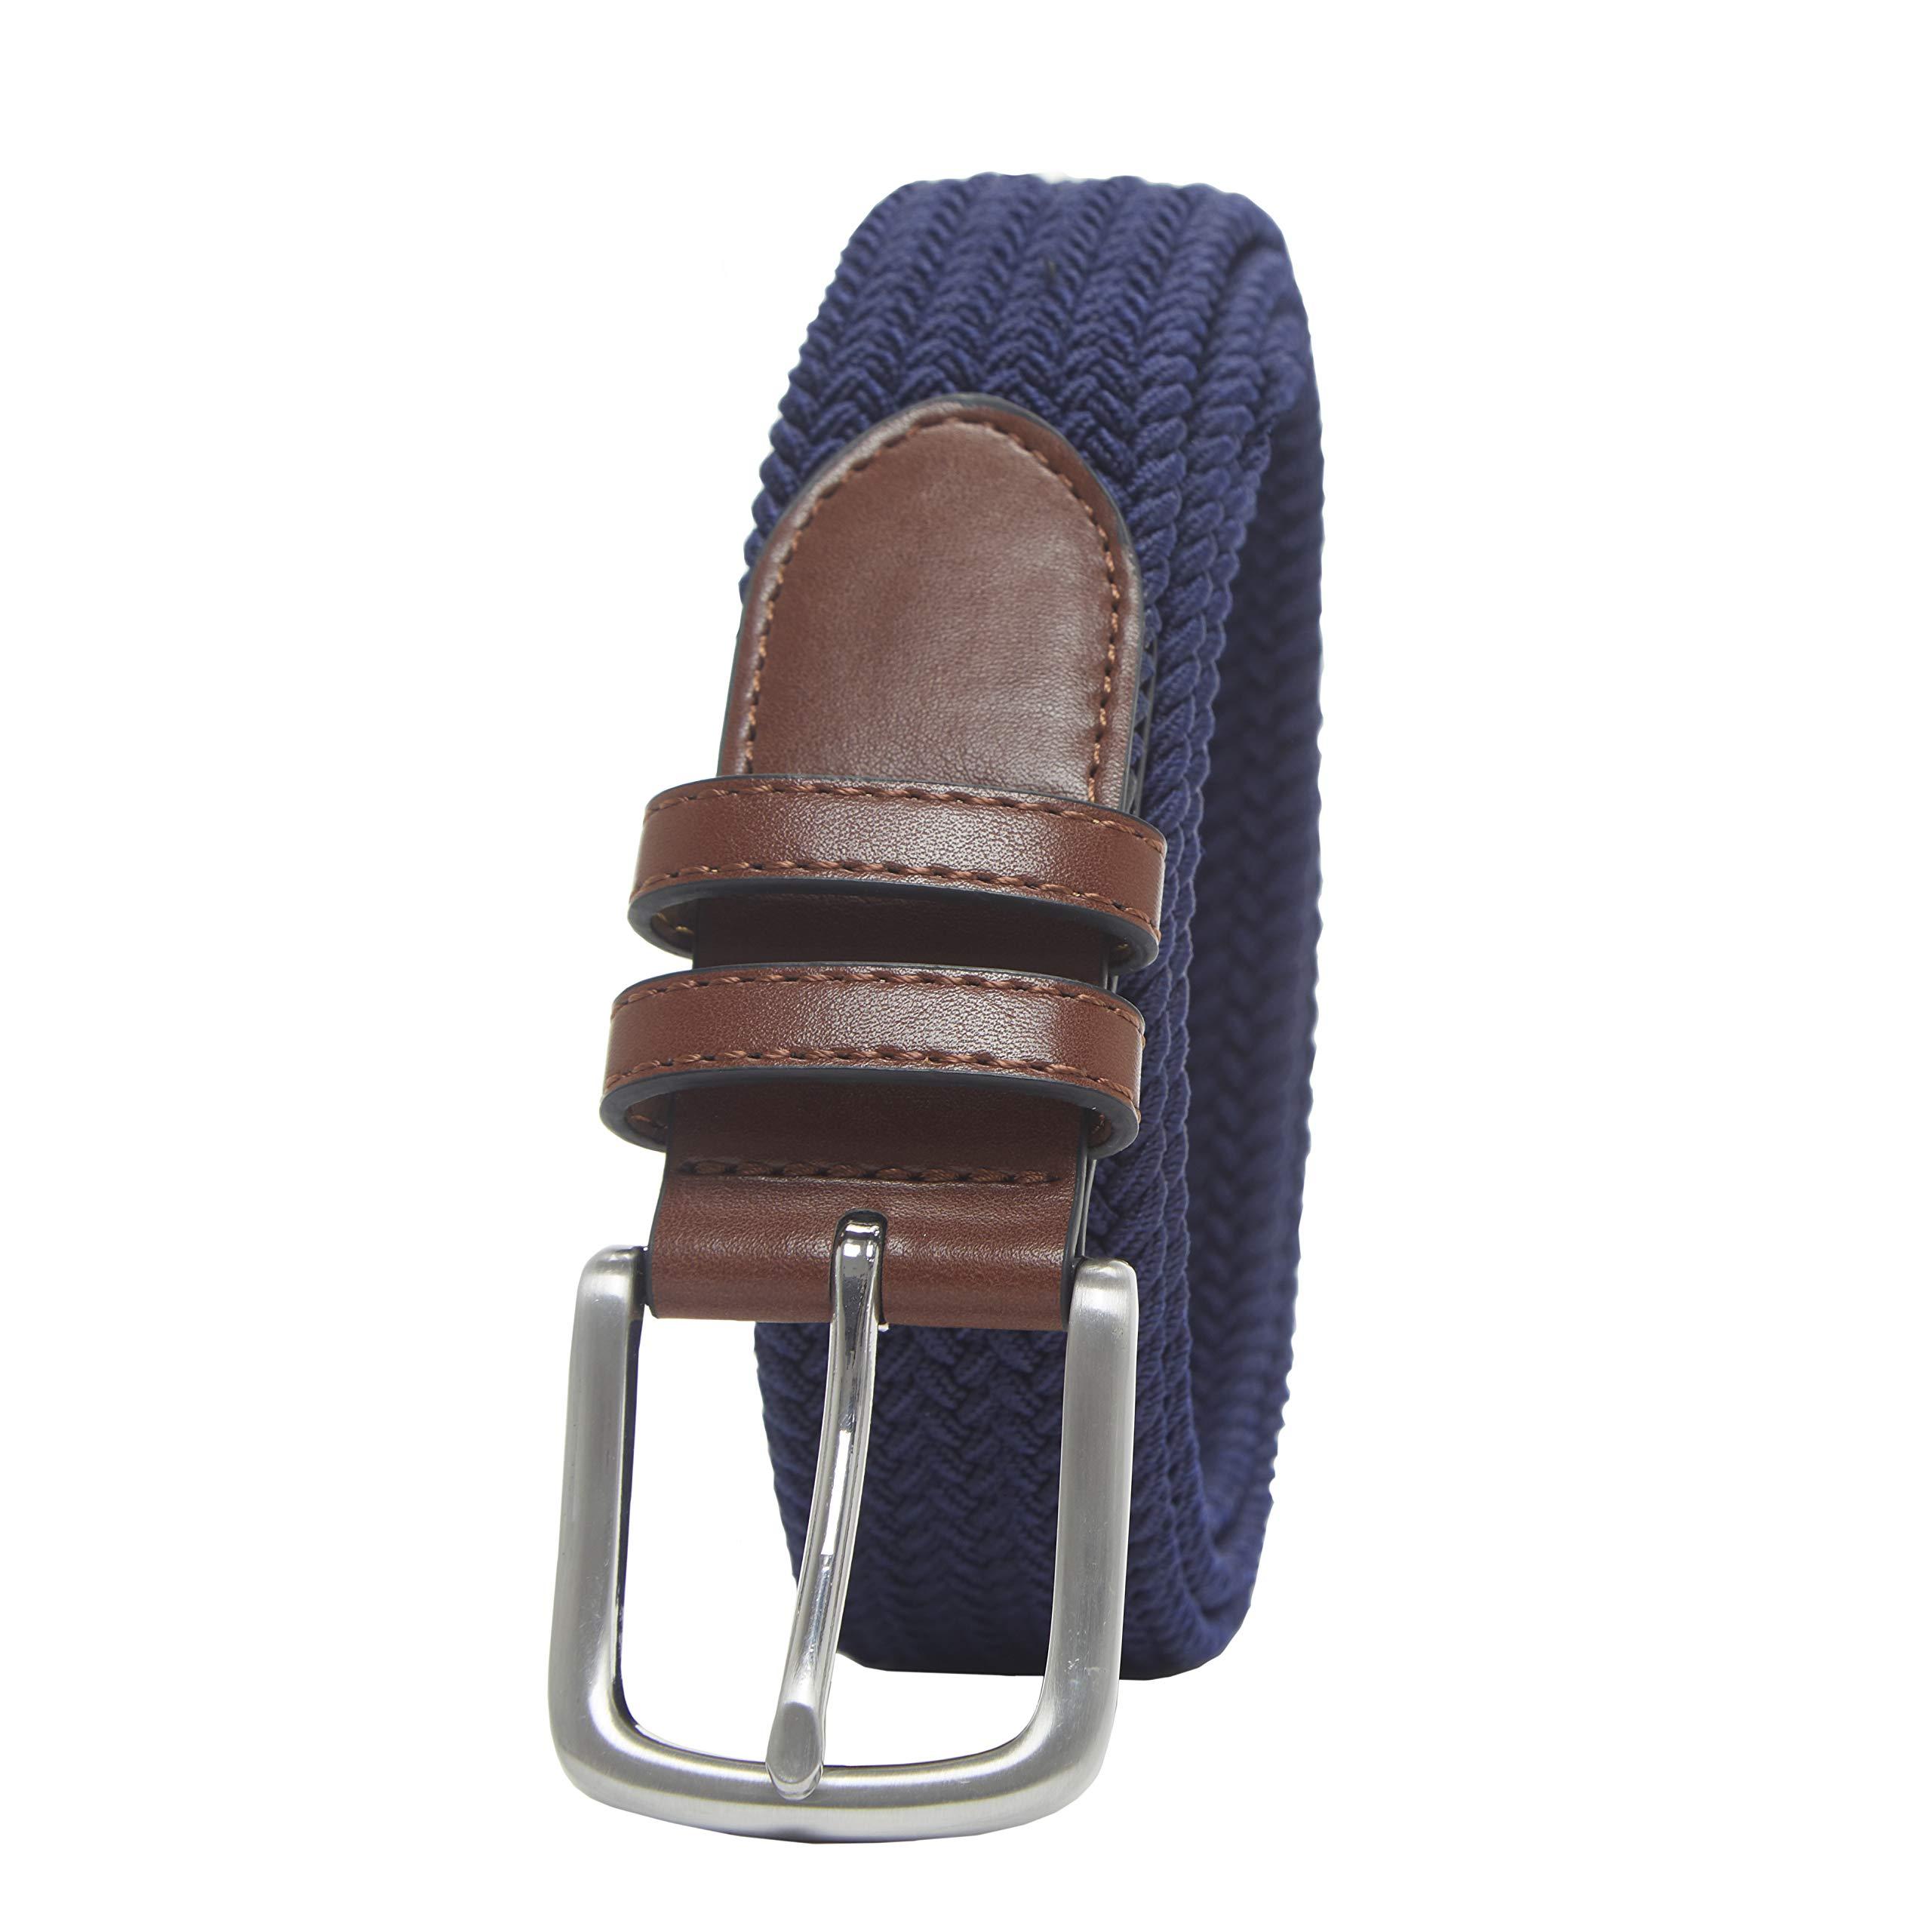 Amazon Essentials Stretch Woven Braid